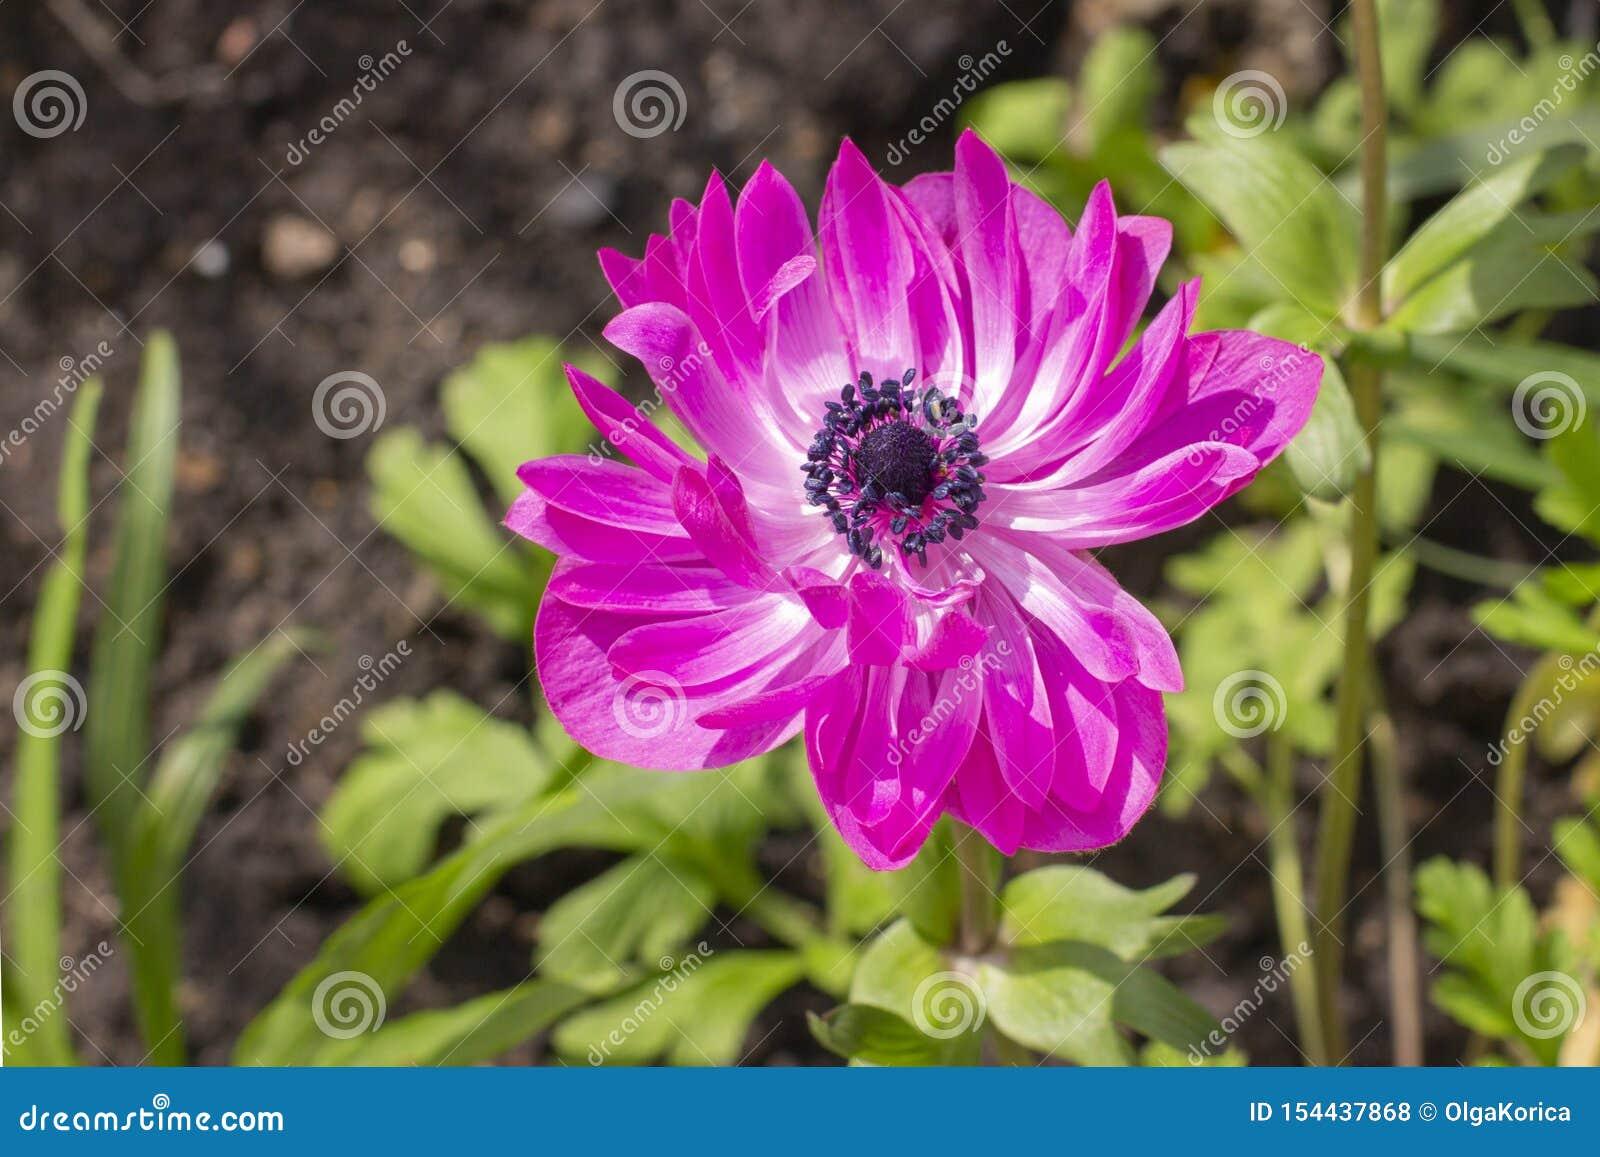 Petales Magenta D Anemone St Brigid Double Flowering Belle Fleur